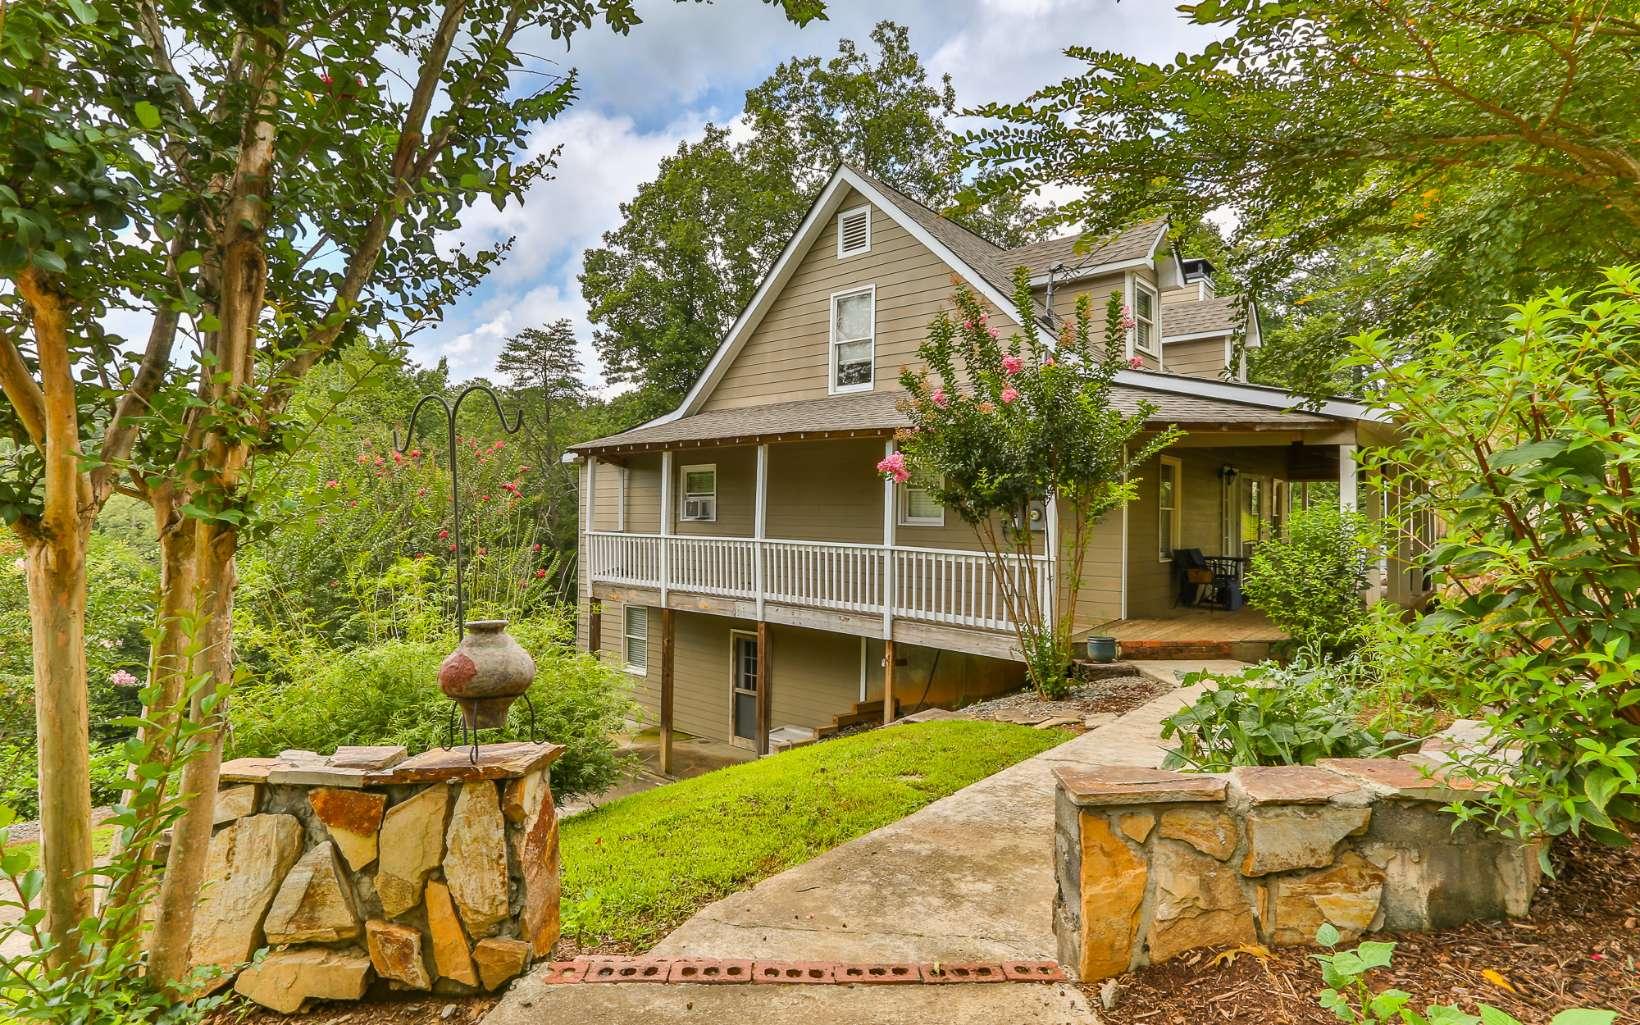 302 MORELAND DR, Ellijay, Georgia 30540, 3 Bedrooms Bedrooms, ,2 BathroomsBathrooms,Single Family,For Sale,302 MORELAND DR,299248